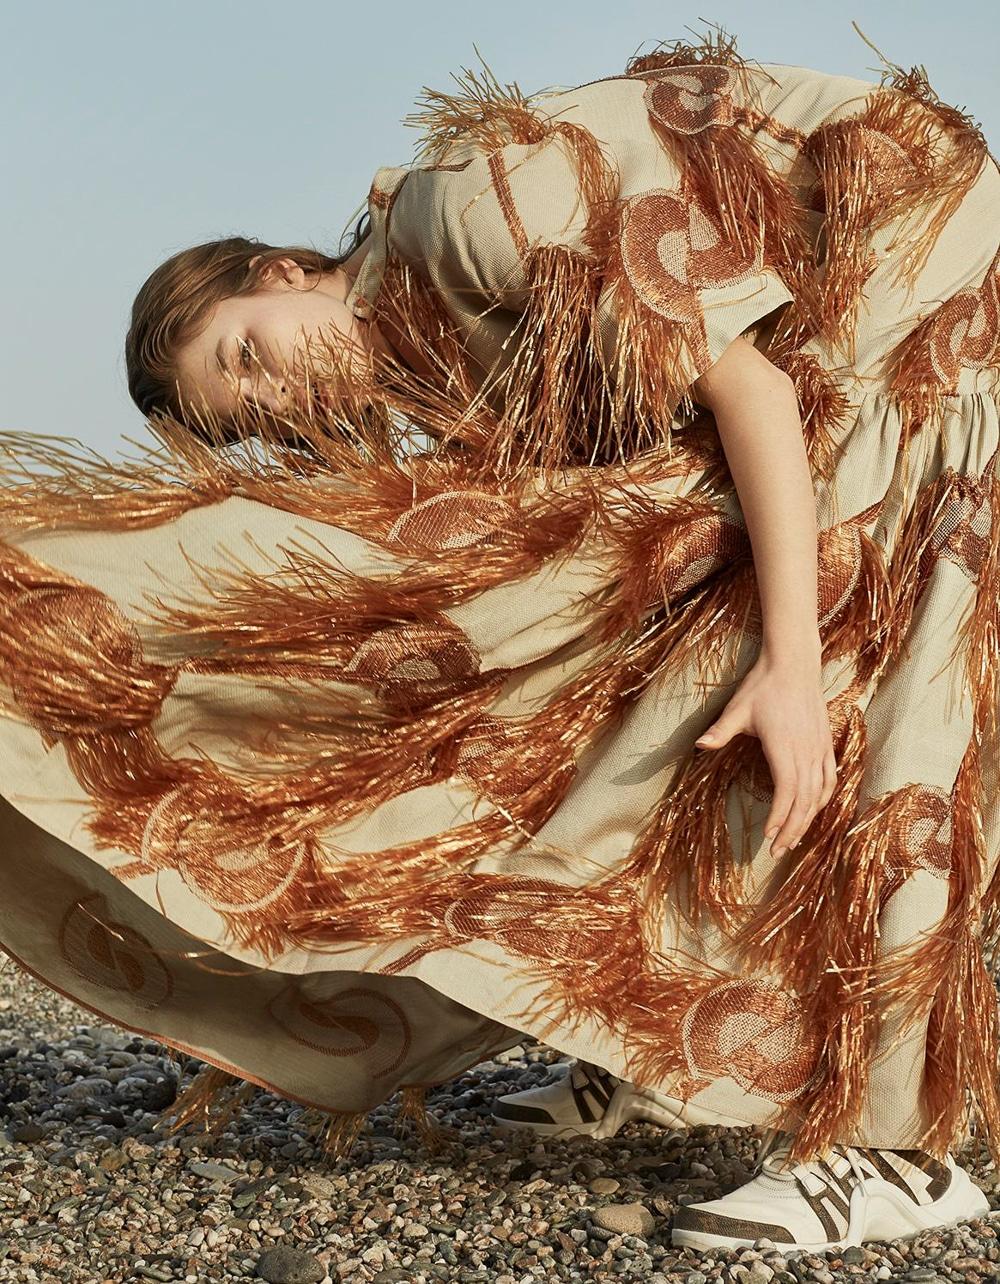 Vogue-Poland-Molly-Smith-Agata-Pospieszynska-1.jpg